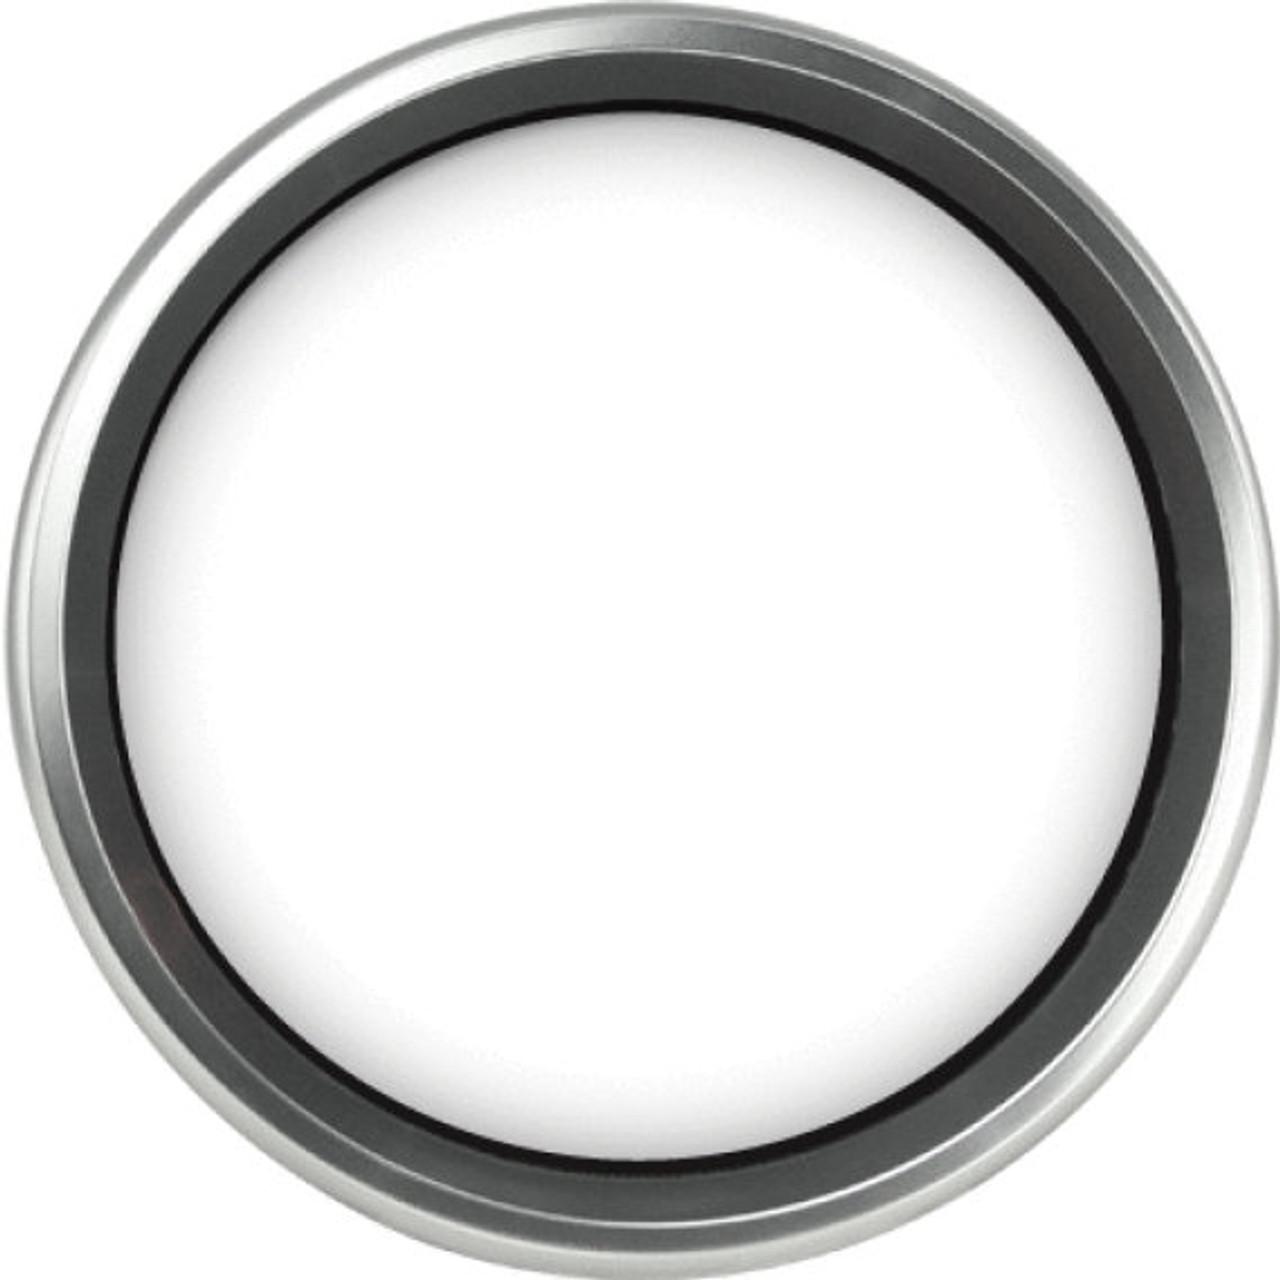 "Revolution Silver Replacement Bezel for 4-1/2"" gauge"